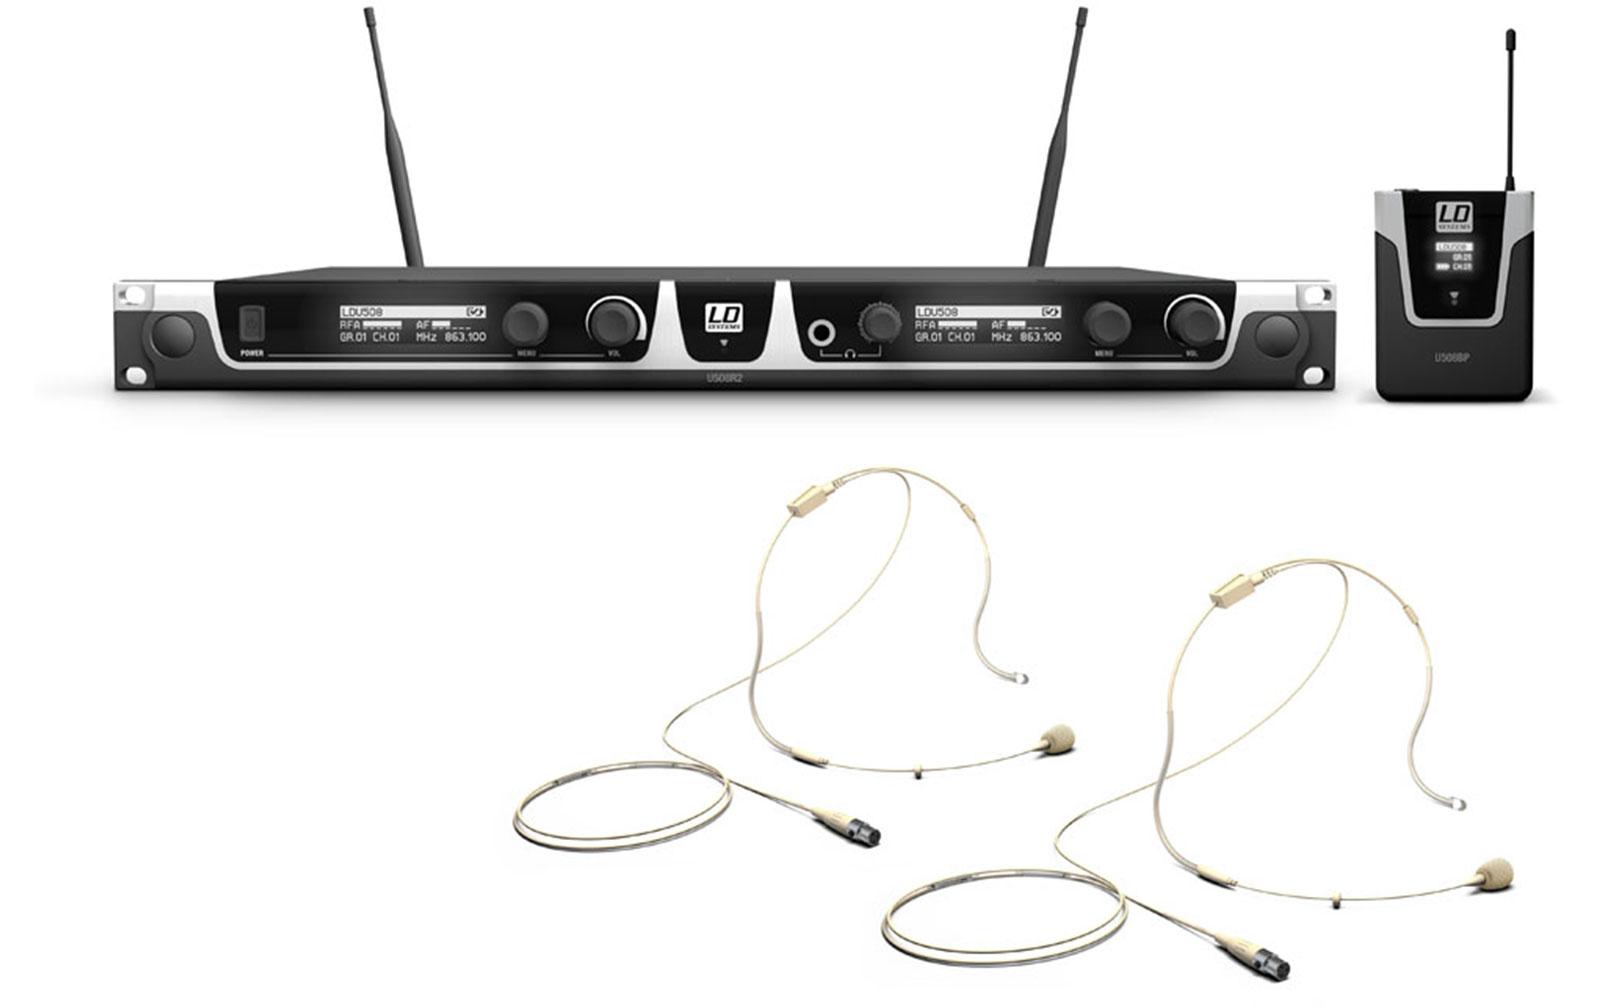 ld-systems-u508-bphh-2-funkmikrofon-system-mit-2-x-bodypack-und-2-x-headset-beigefarben